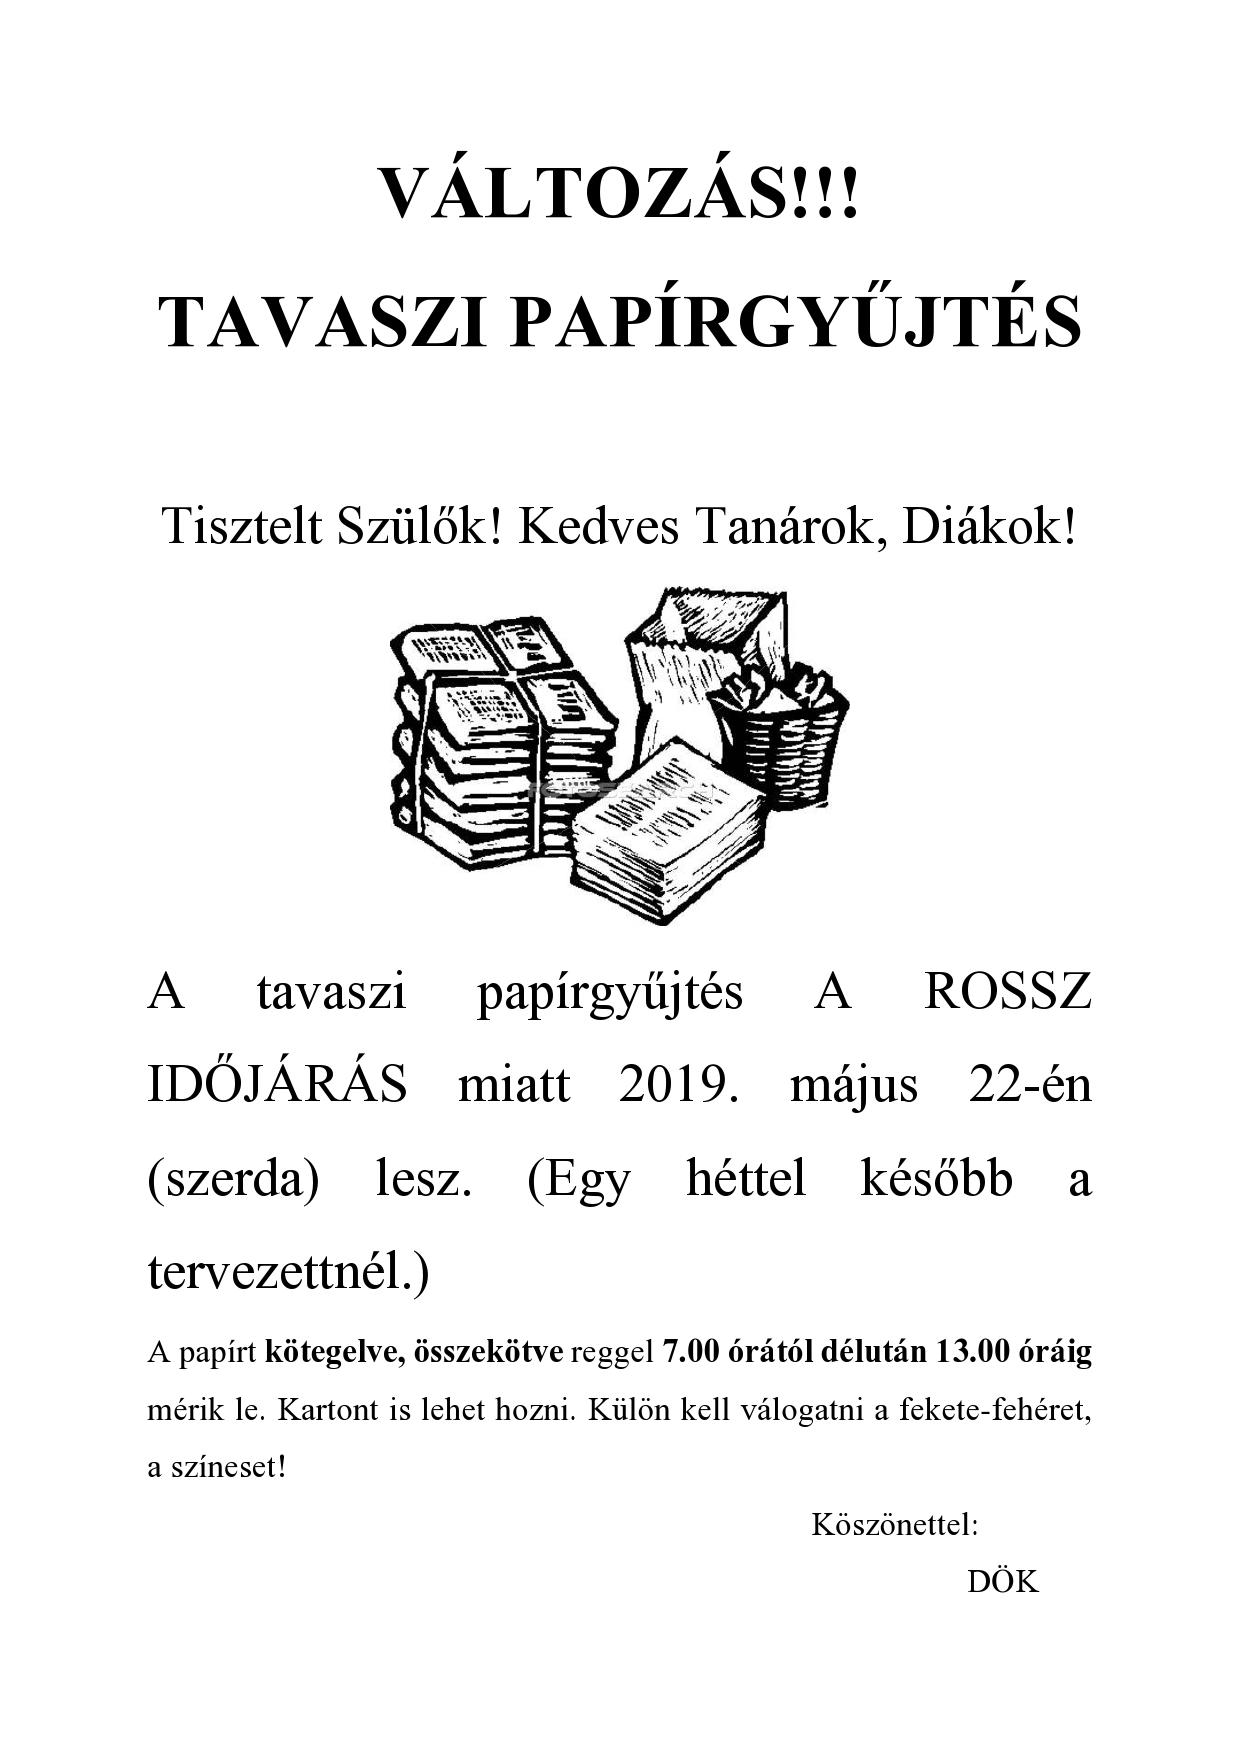 tavaszi_papirgyujtes_2019_1_-page0001.jpg